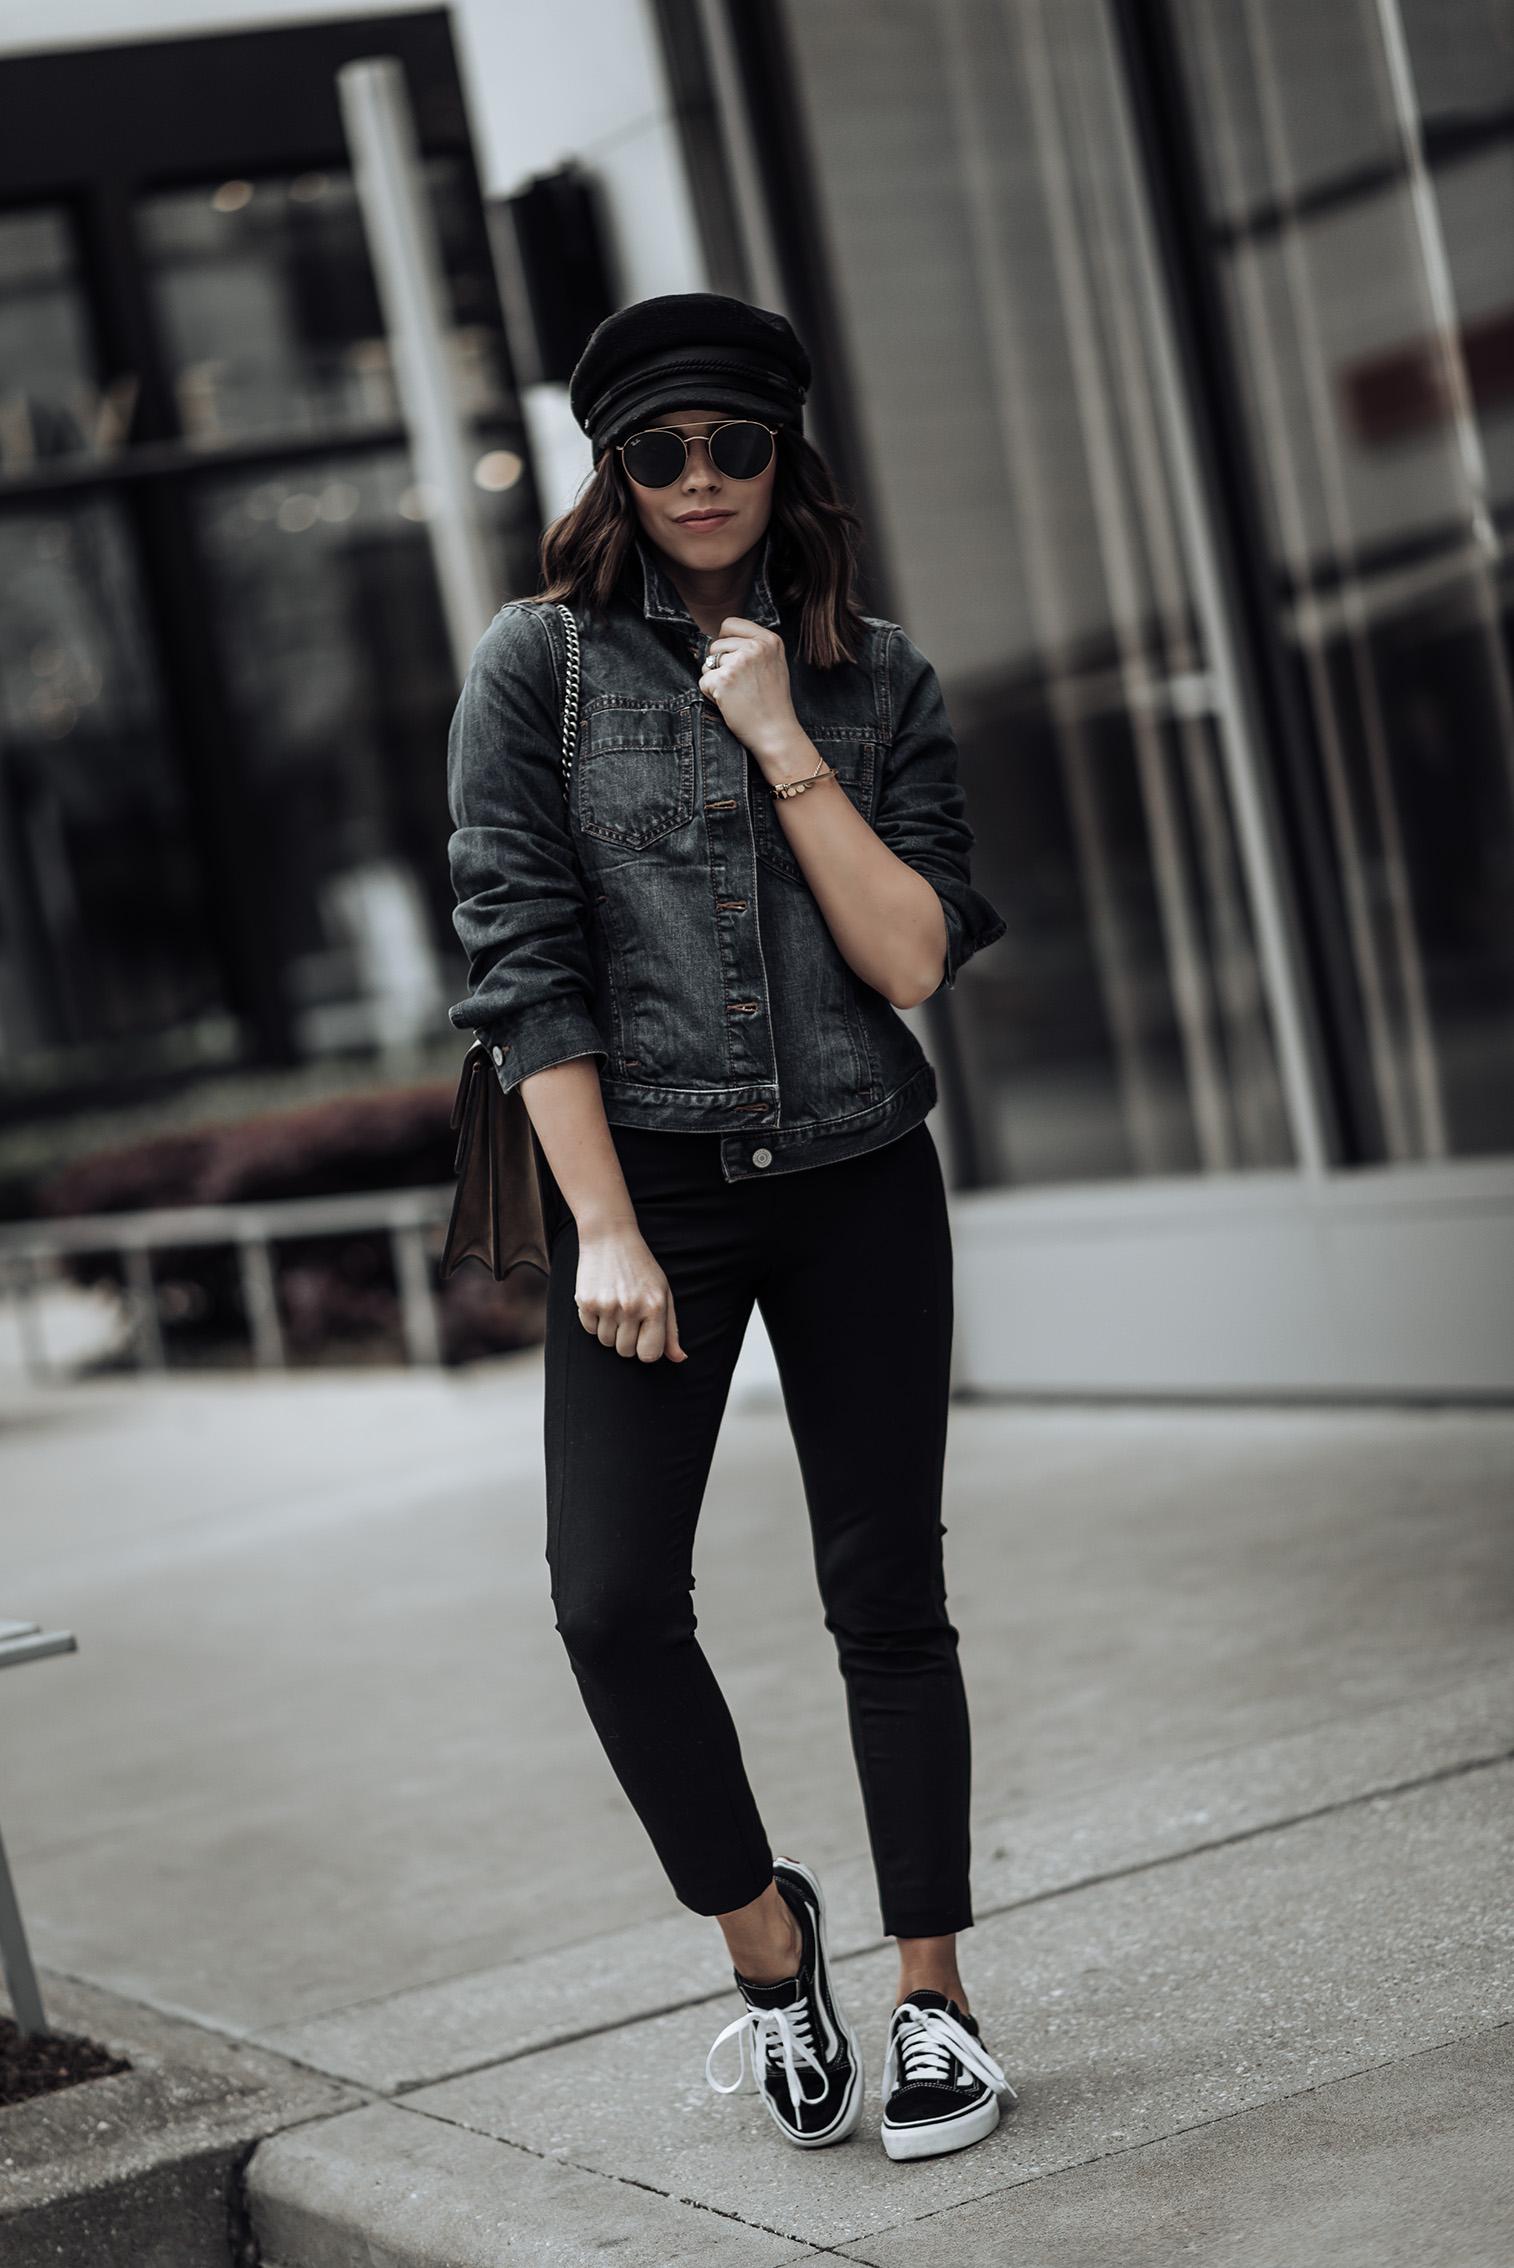 Banana Republic closet essentials | First look: Classic Denim Jacket |Devon High Rise Legging| Second look: Trench Coat |Devon High Rise Legging| Black Point Toe Tie Heels |